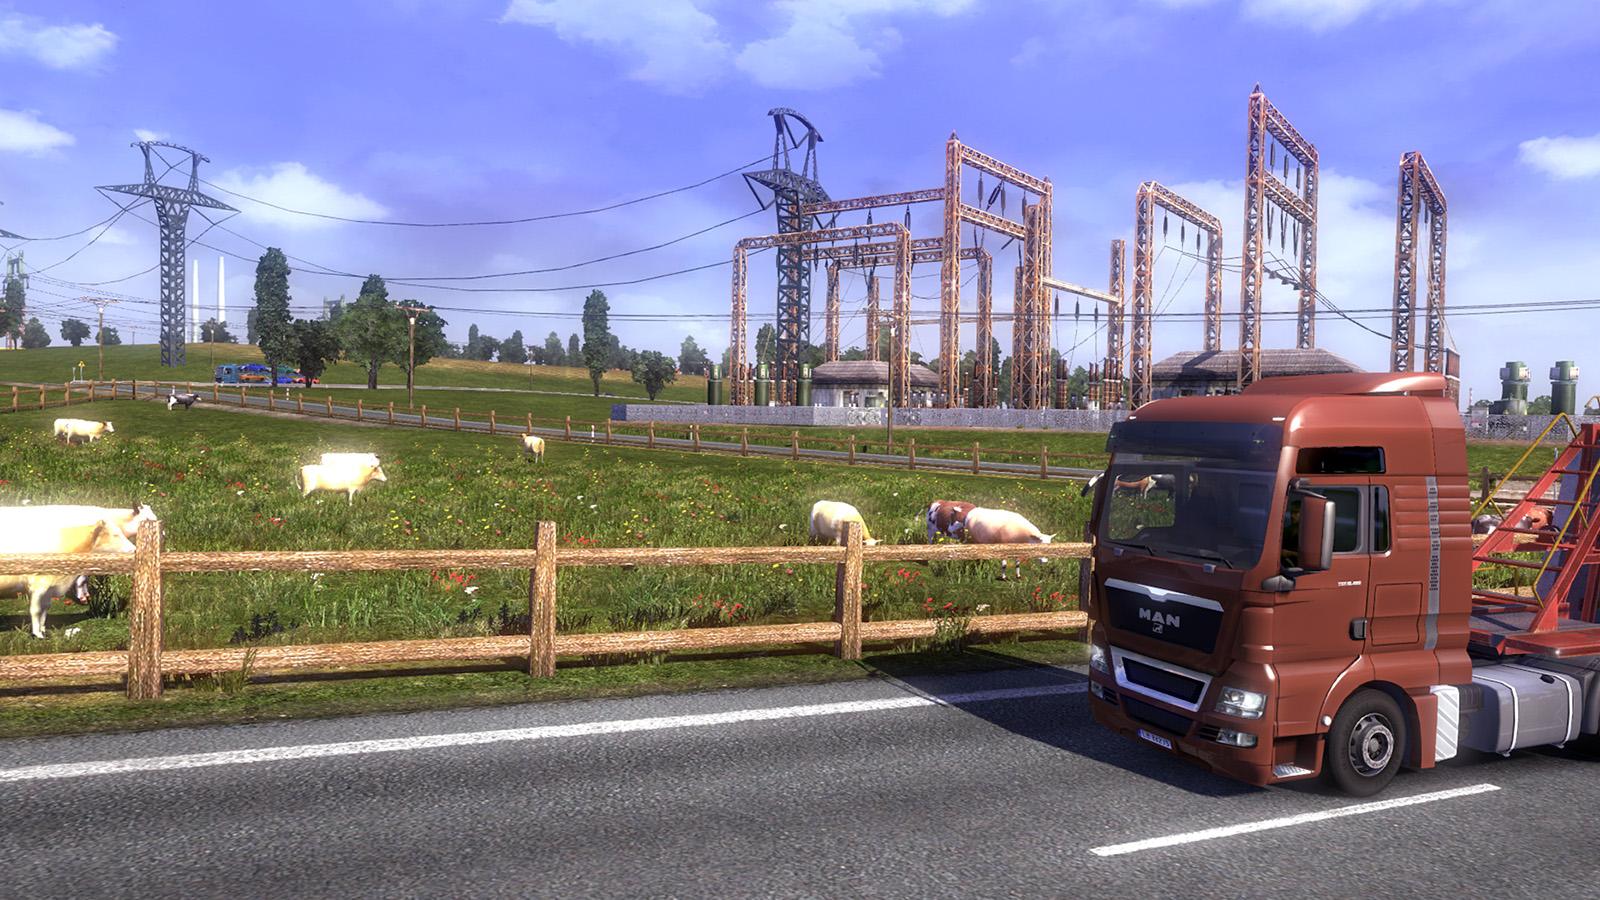 euro truck simulator 2 patch 1 5 2 und dlc preload news. Black Bedroom Furniture Sets. Home Design Ideas